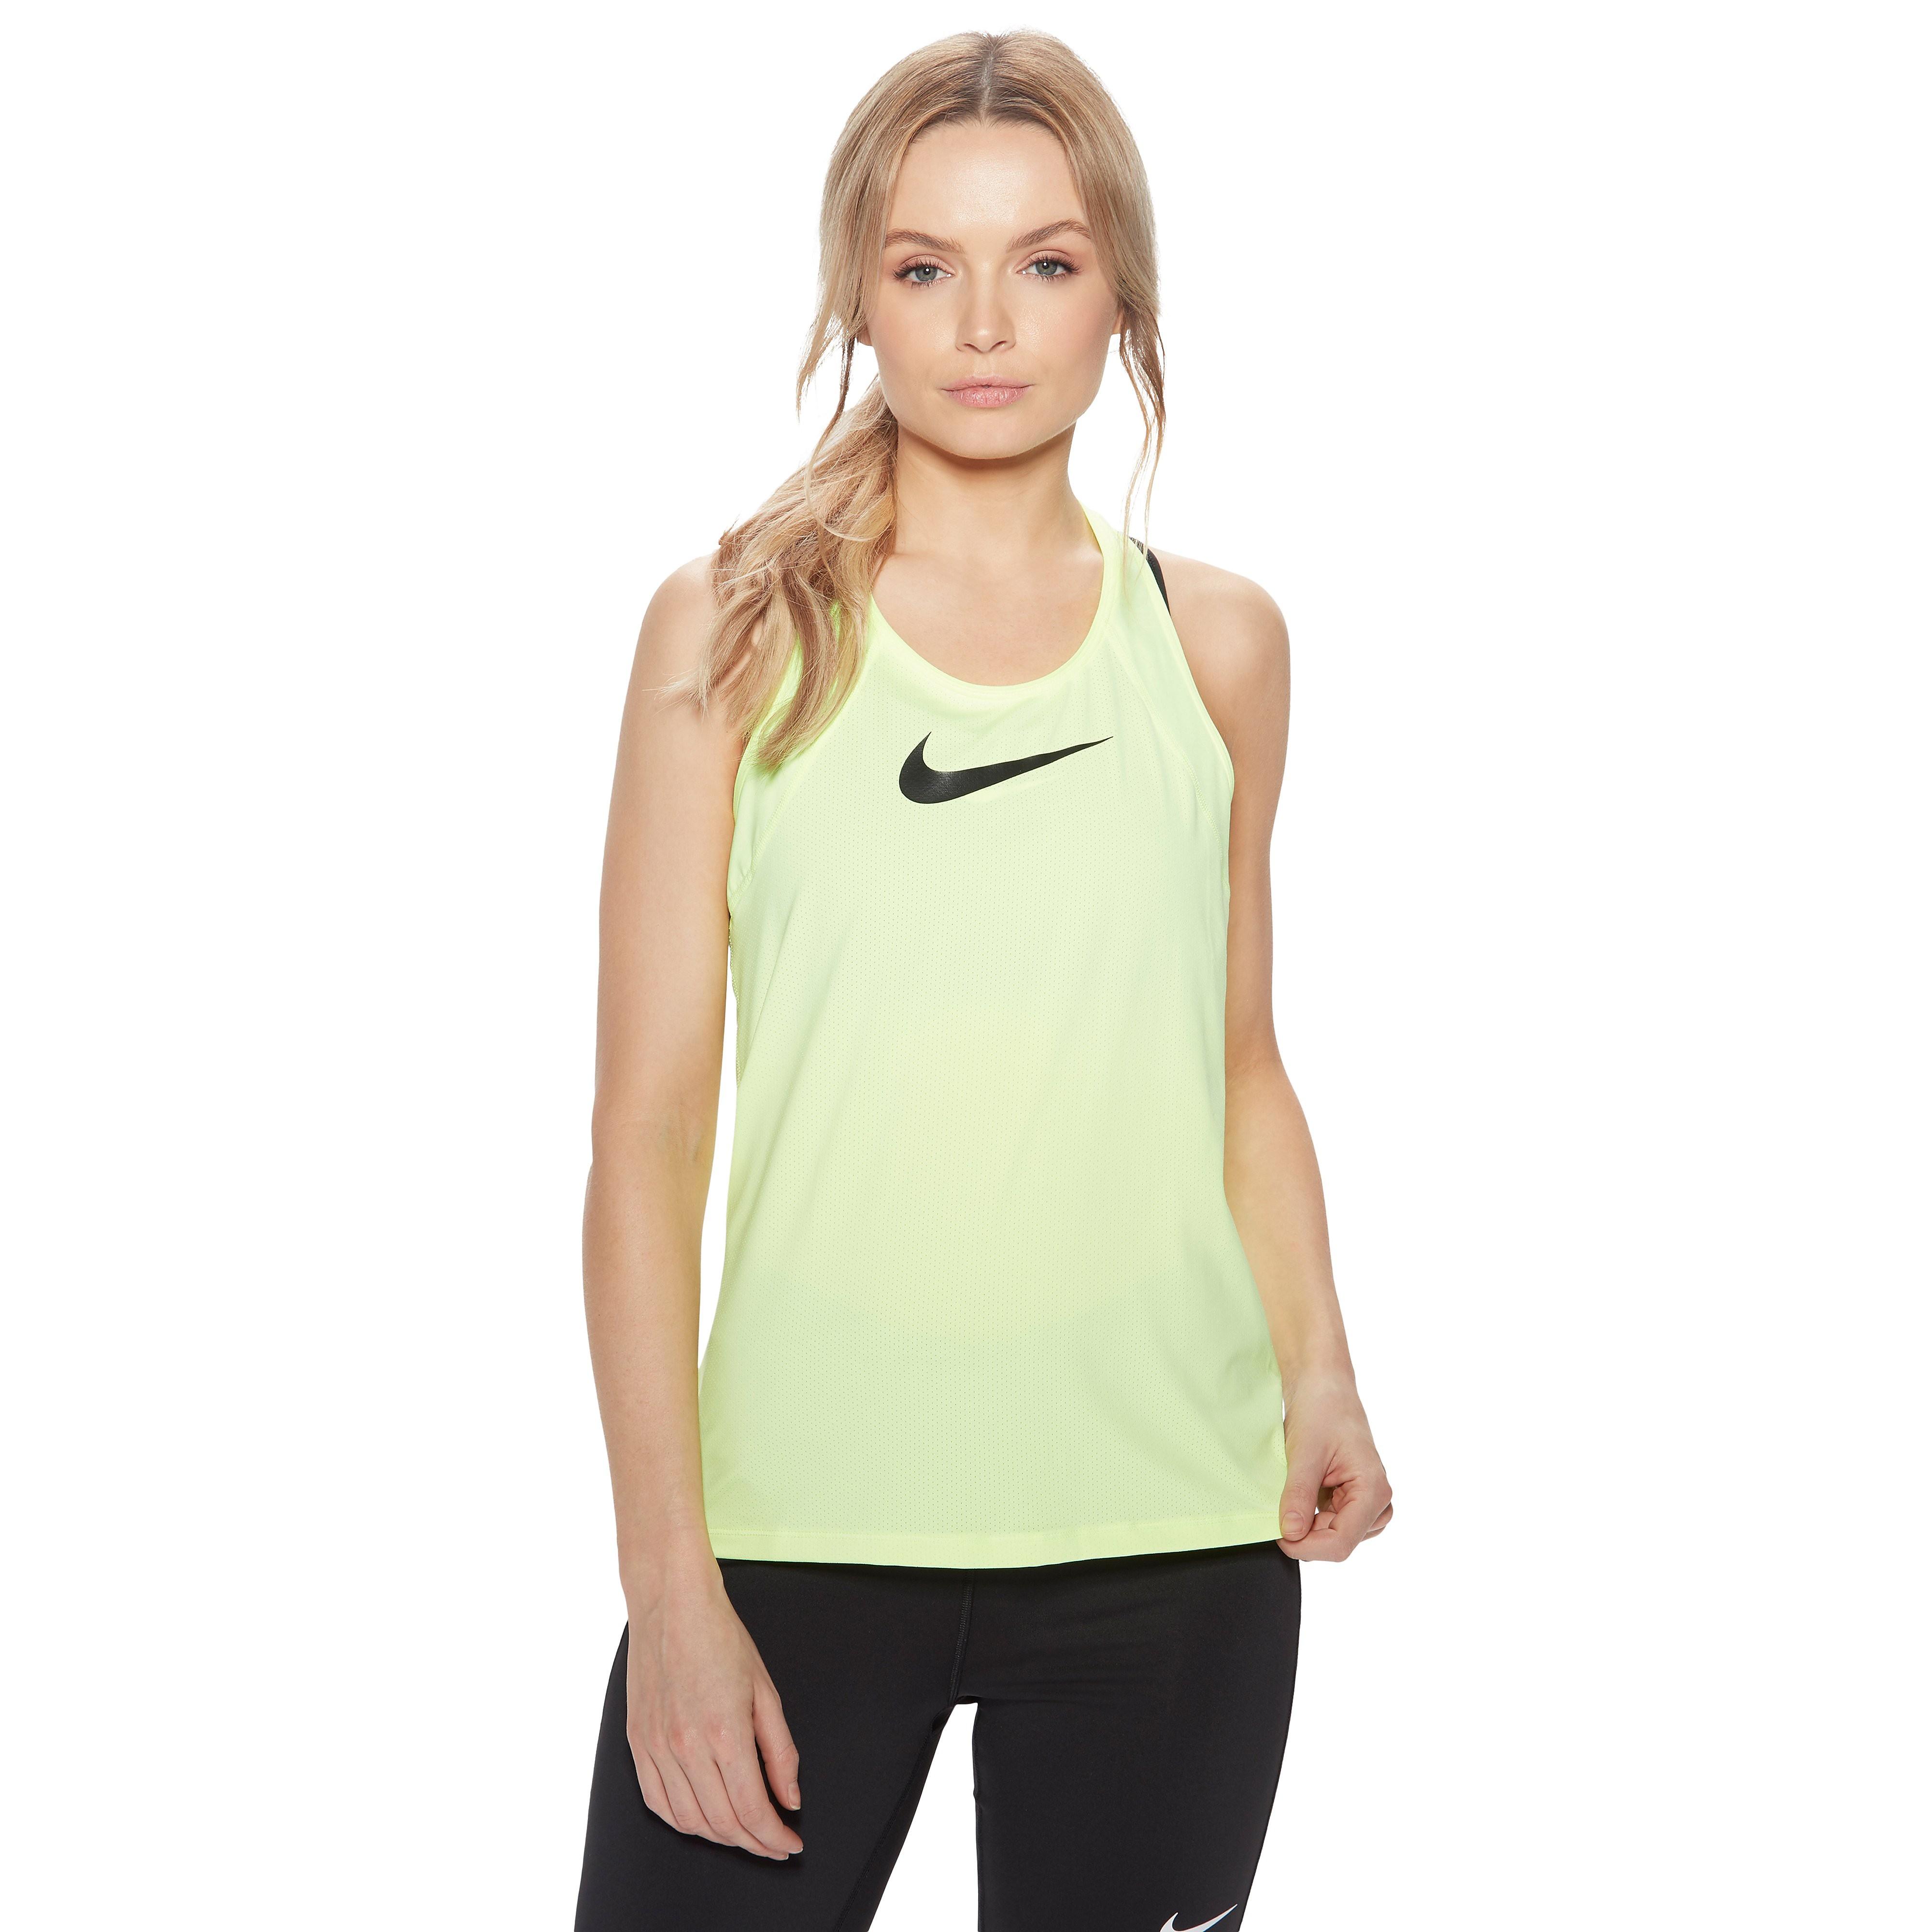 Nike Pro Women's Training Tank Top